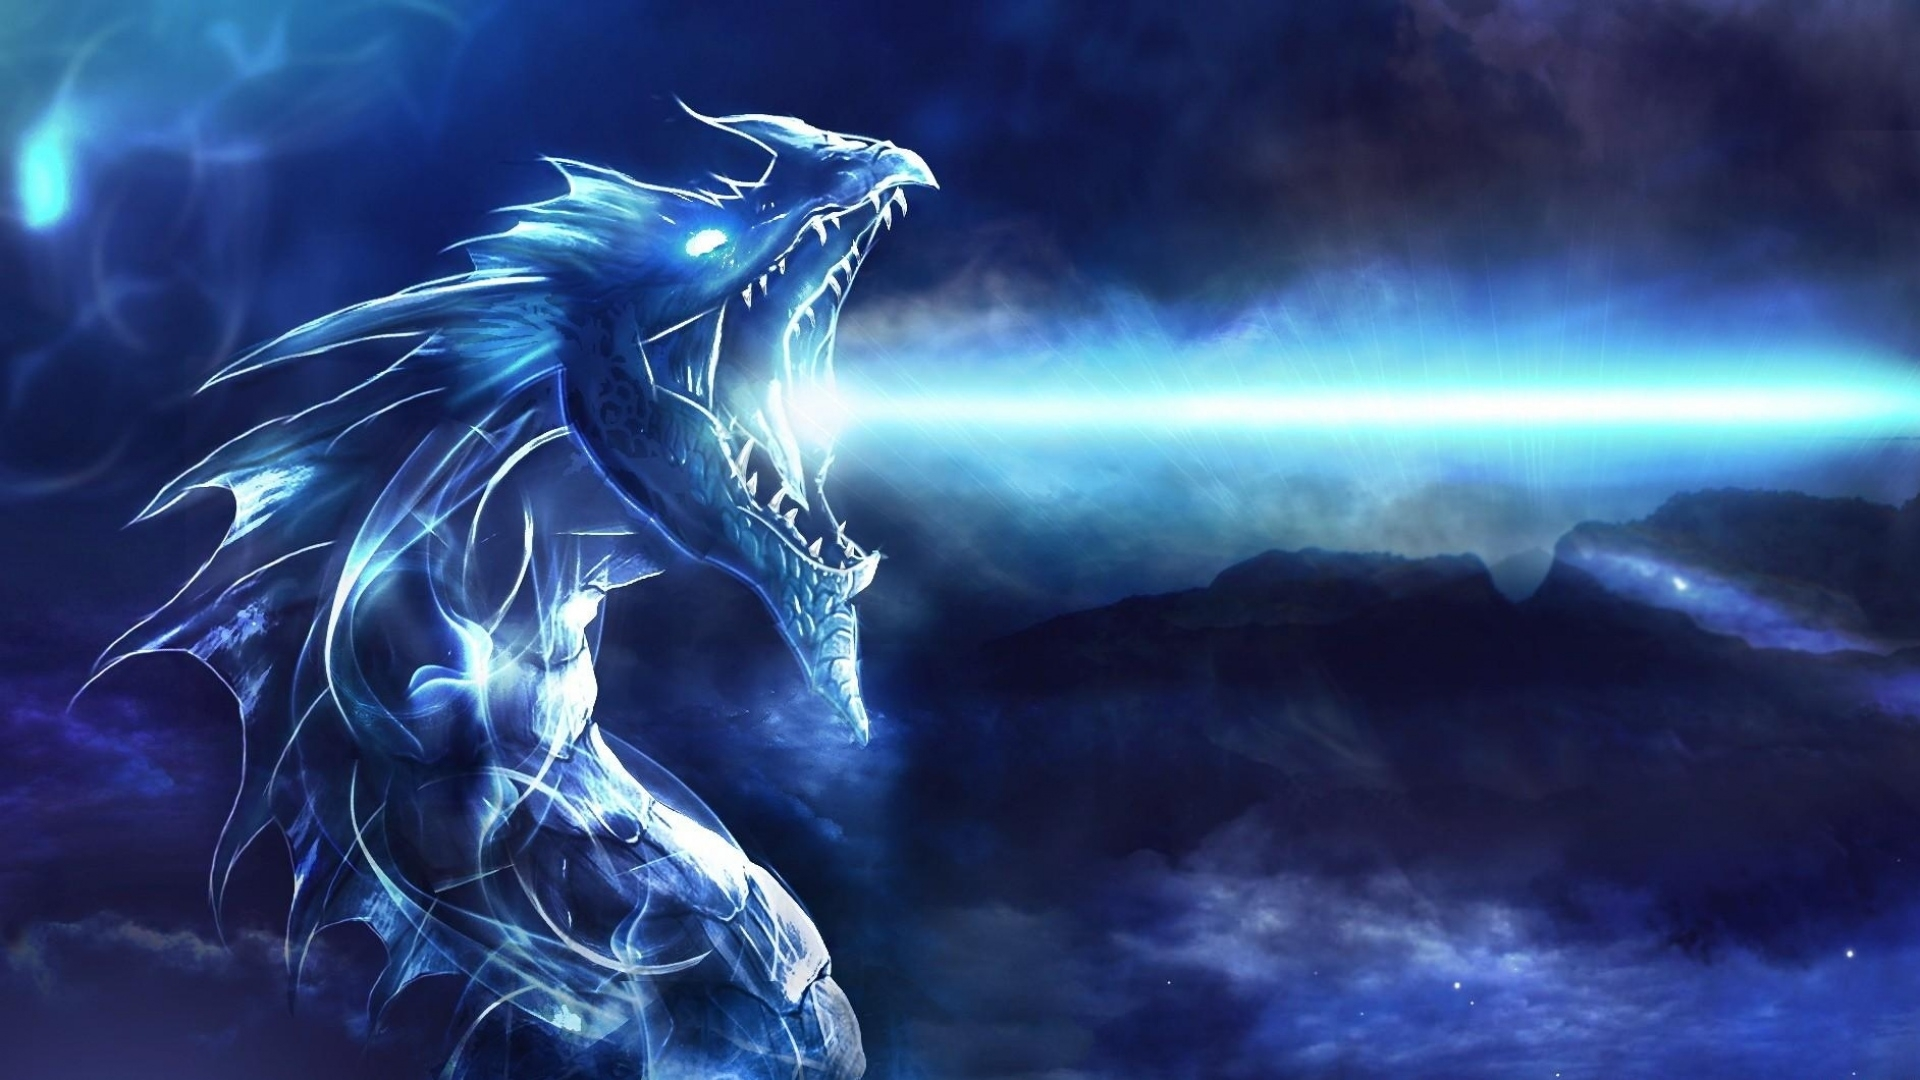 blue dragon wallpaper hd | i luv dragons | pinterest | blue dragon